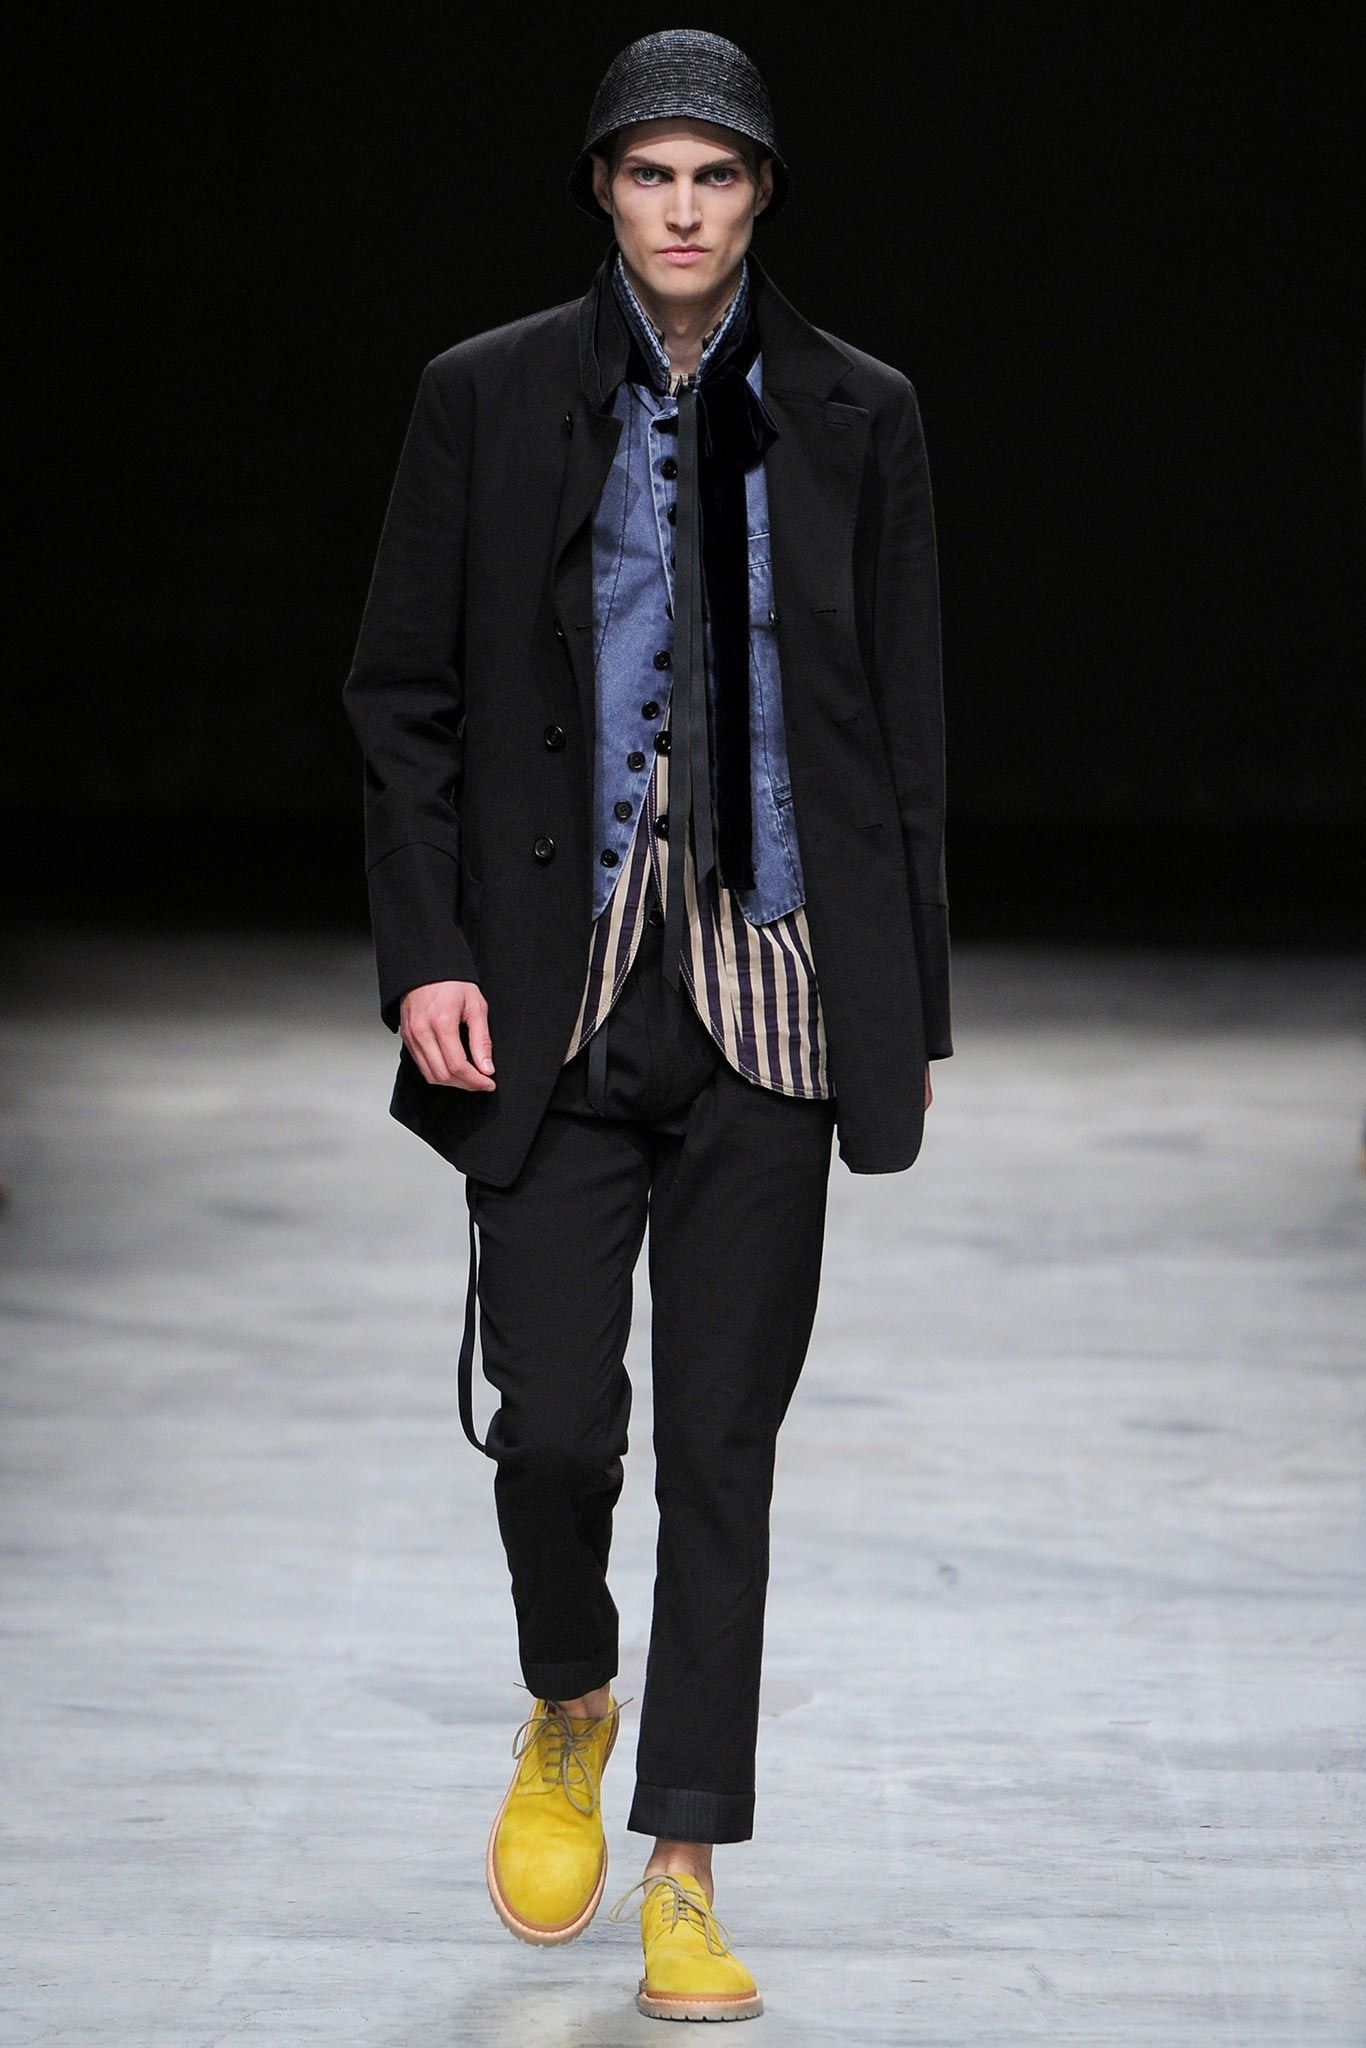 Ann Demeulemeester Spring 2014 Menswear Collection Photos - Vogue